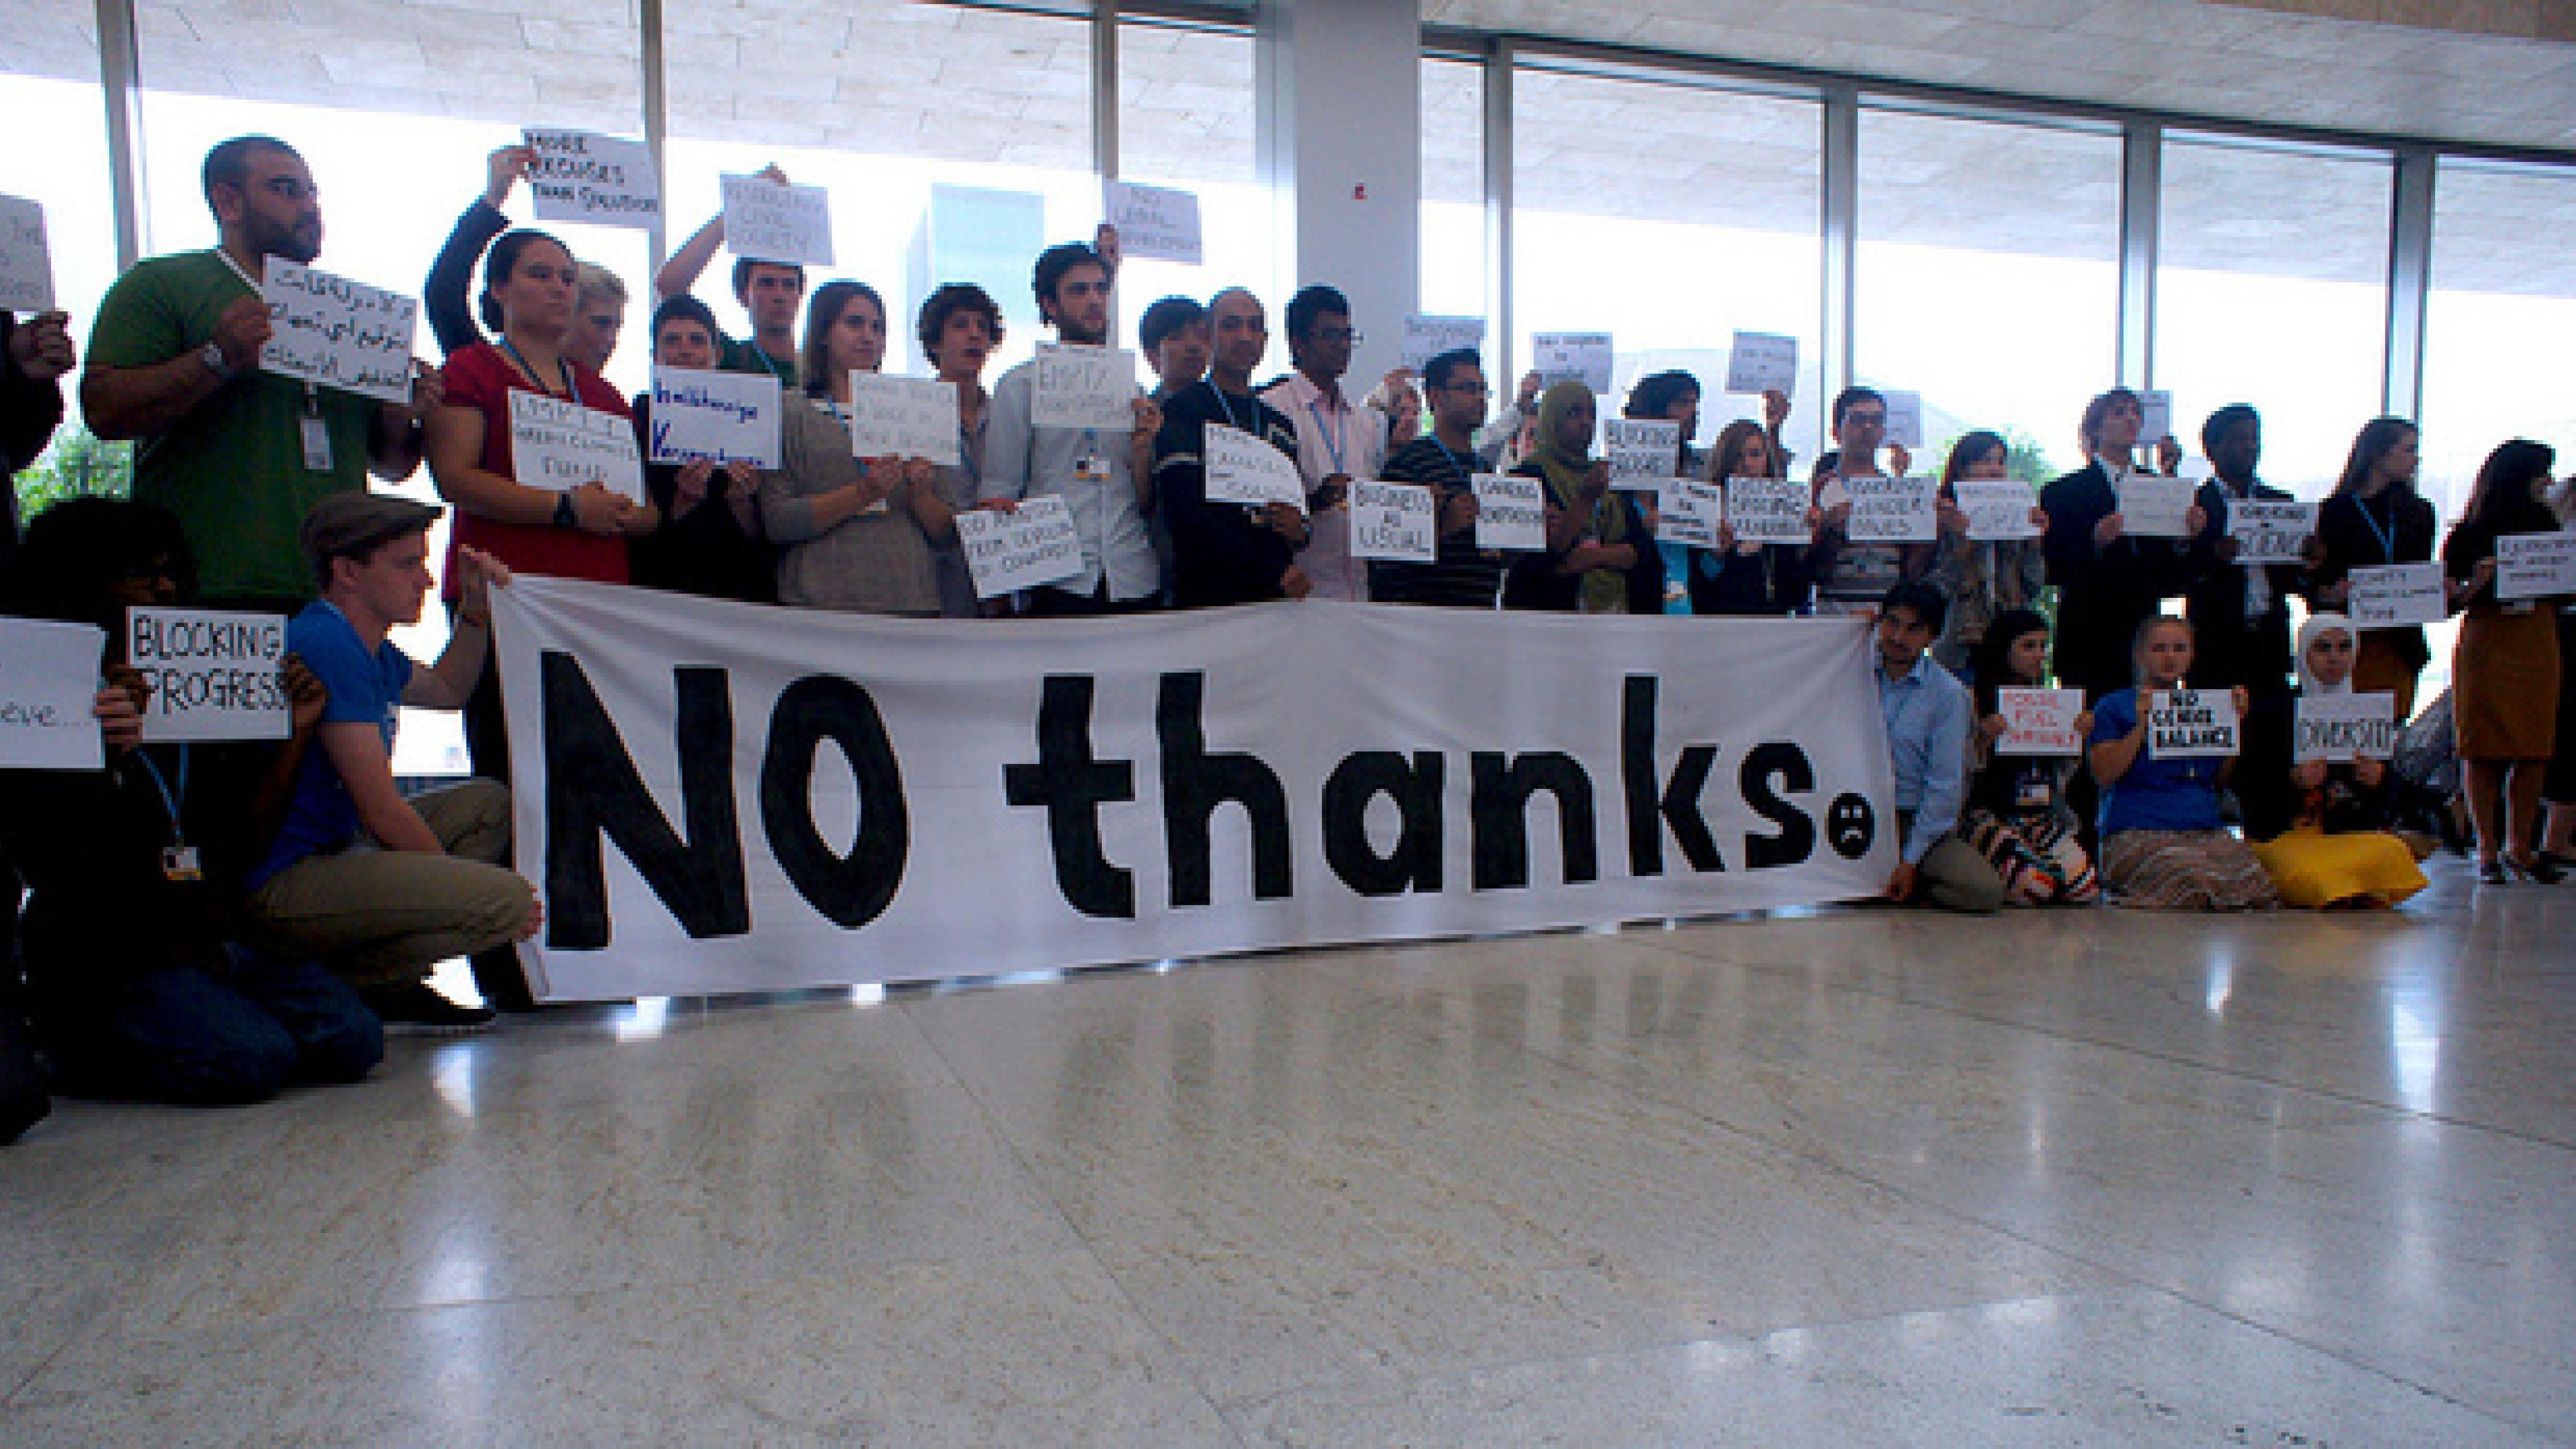 Jugendevent bei der COP 18